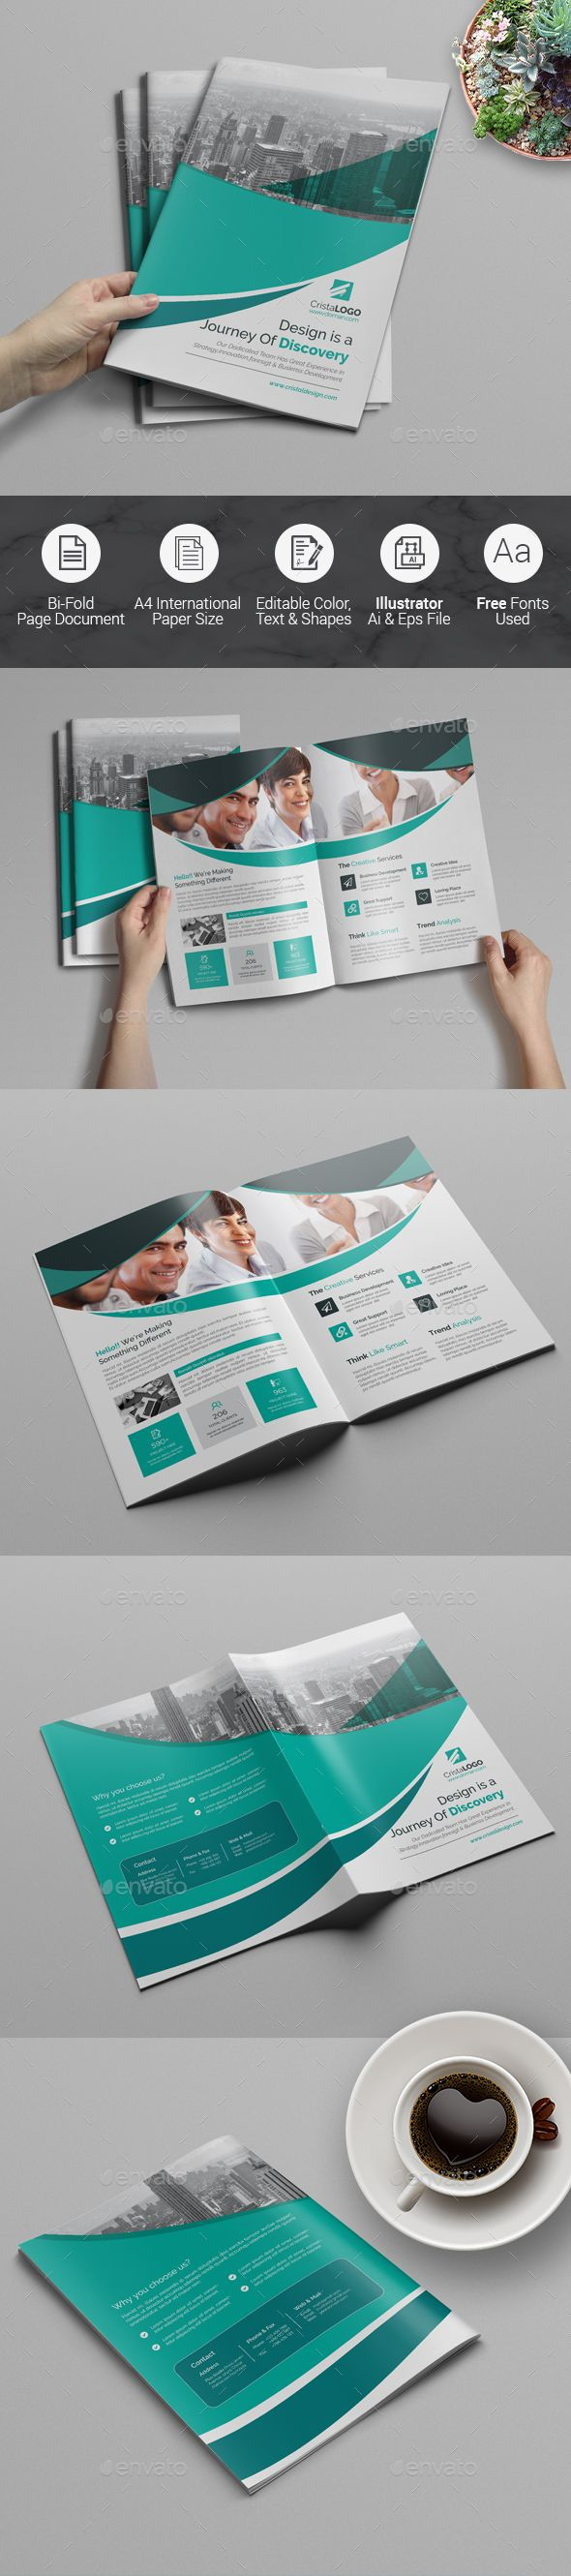 Bi Fold Multipurpose Brochure  Brochures Brochure Template And